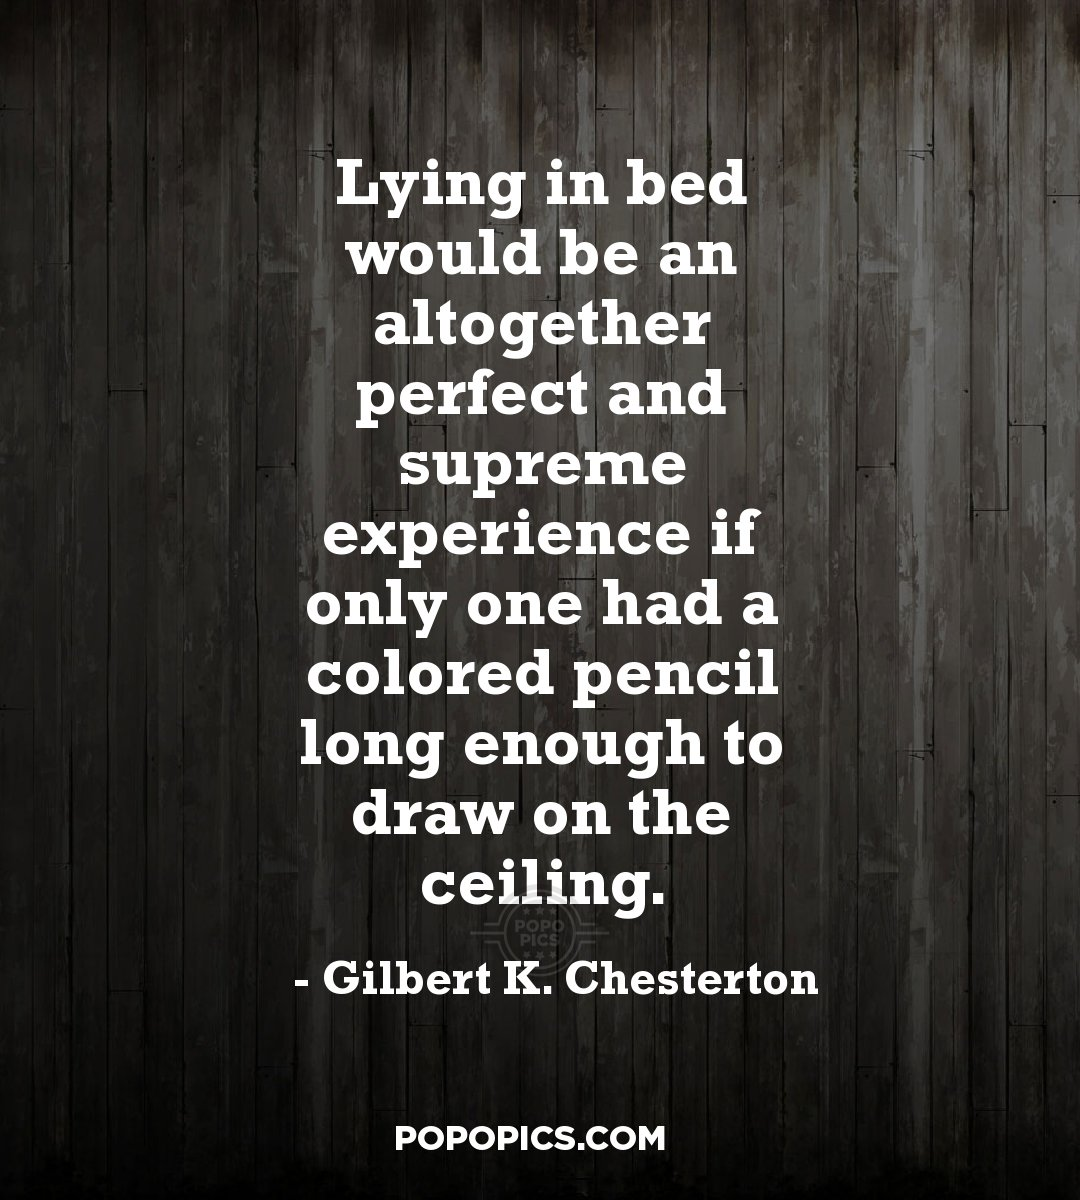 gk chesterton essay on lying in bed